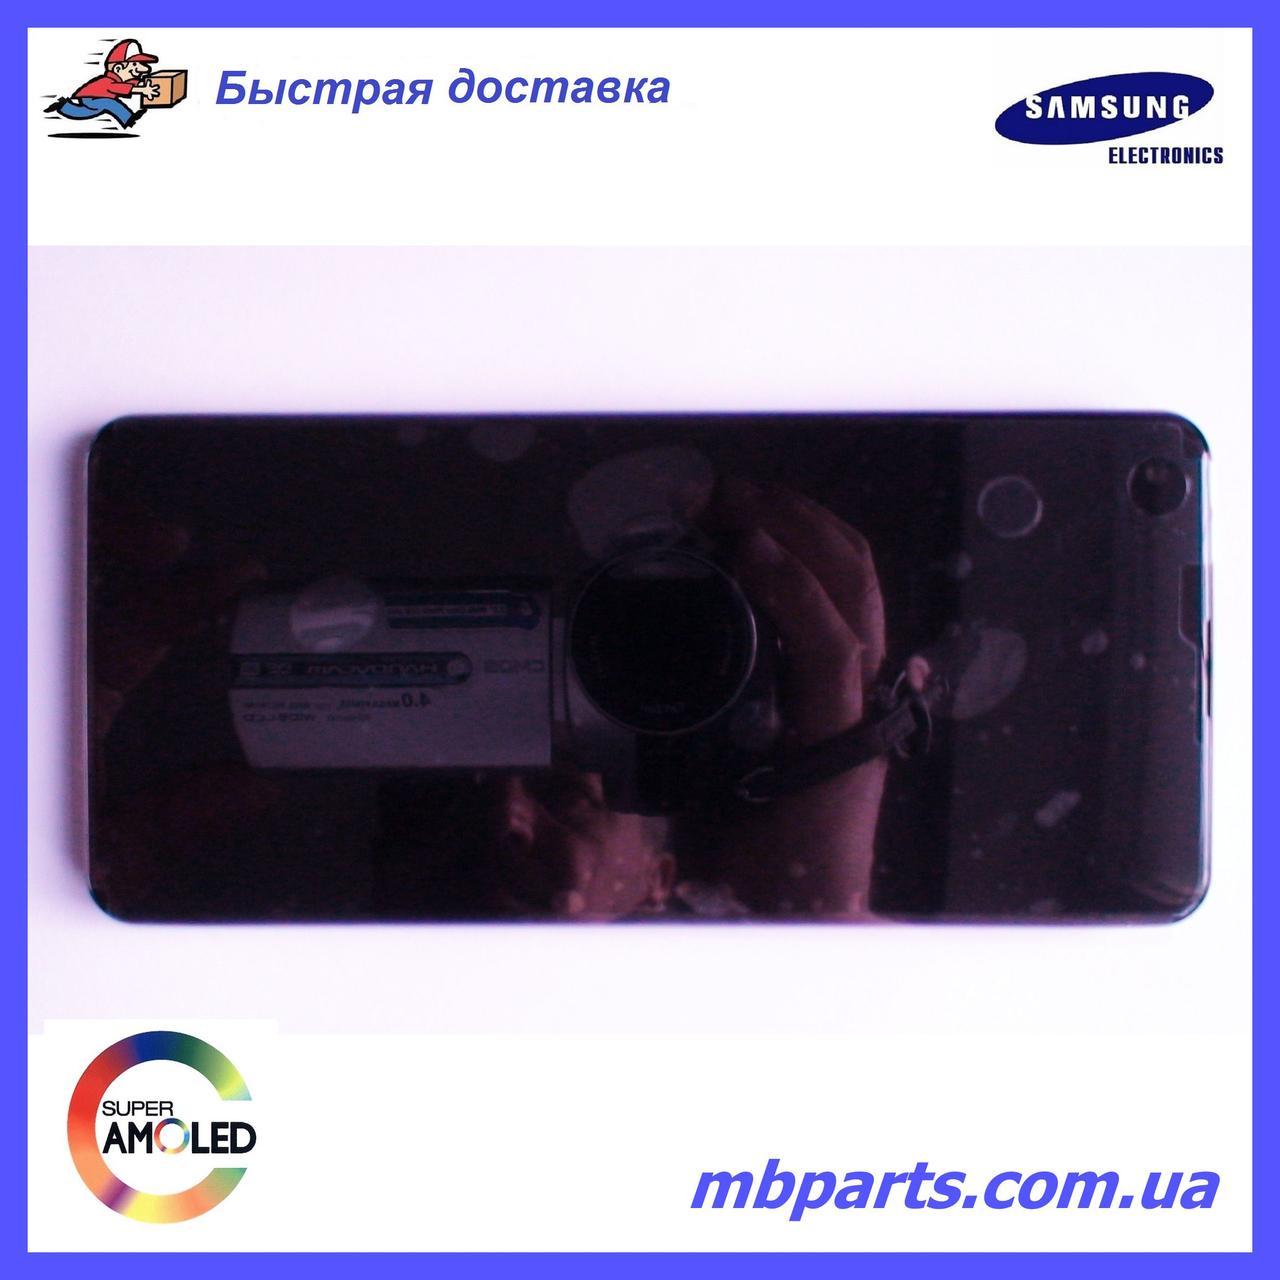 Дисплей с сенсором Samsung А217 Galaxy А21s Black, GH82-22988A, оригинал с рамкой!